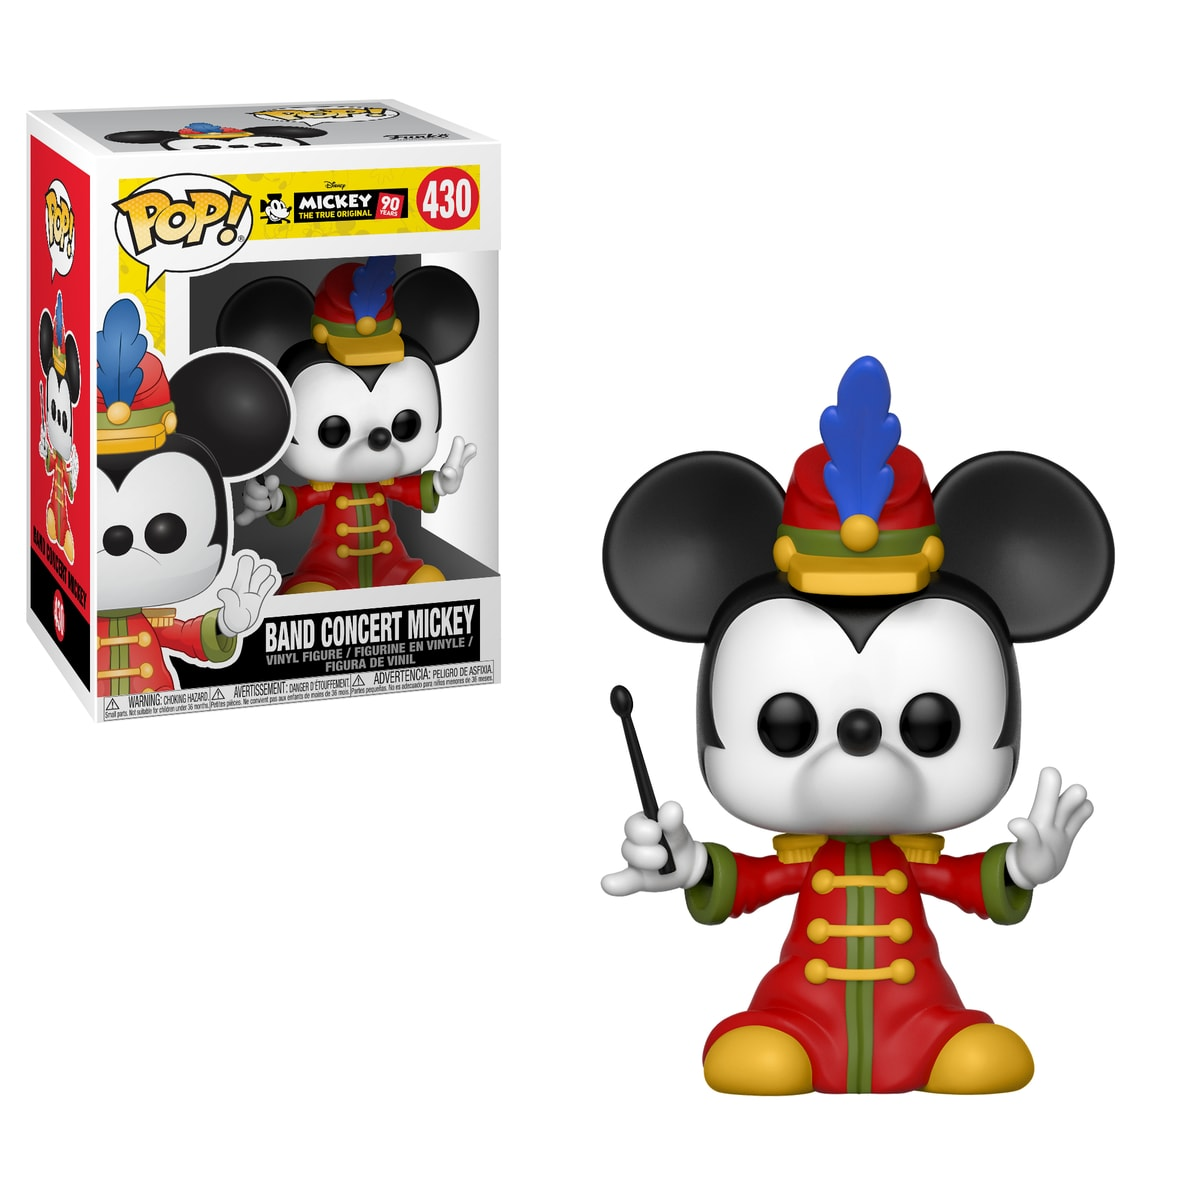 Funko POP Disney: Mickey's 90th Anniversary - Band Concert Mickey (Exc)